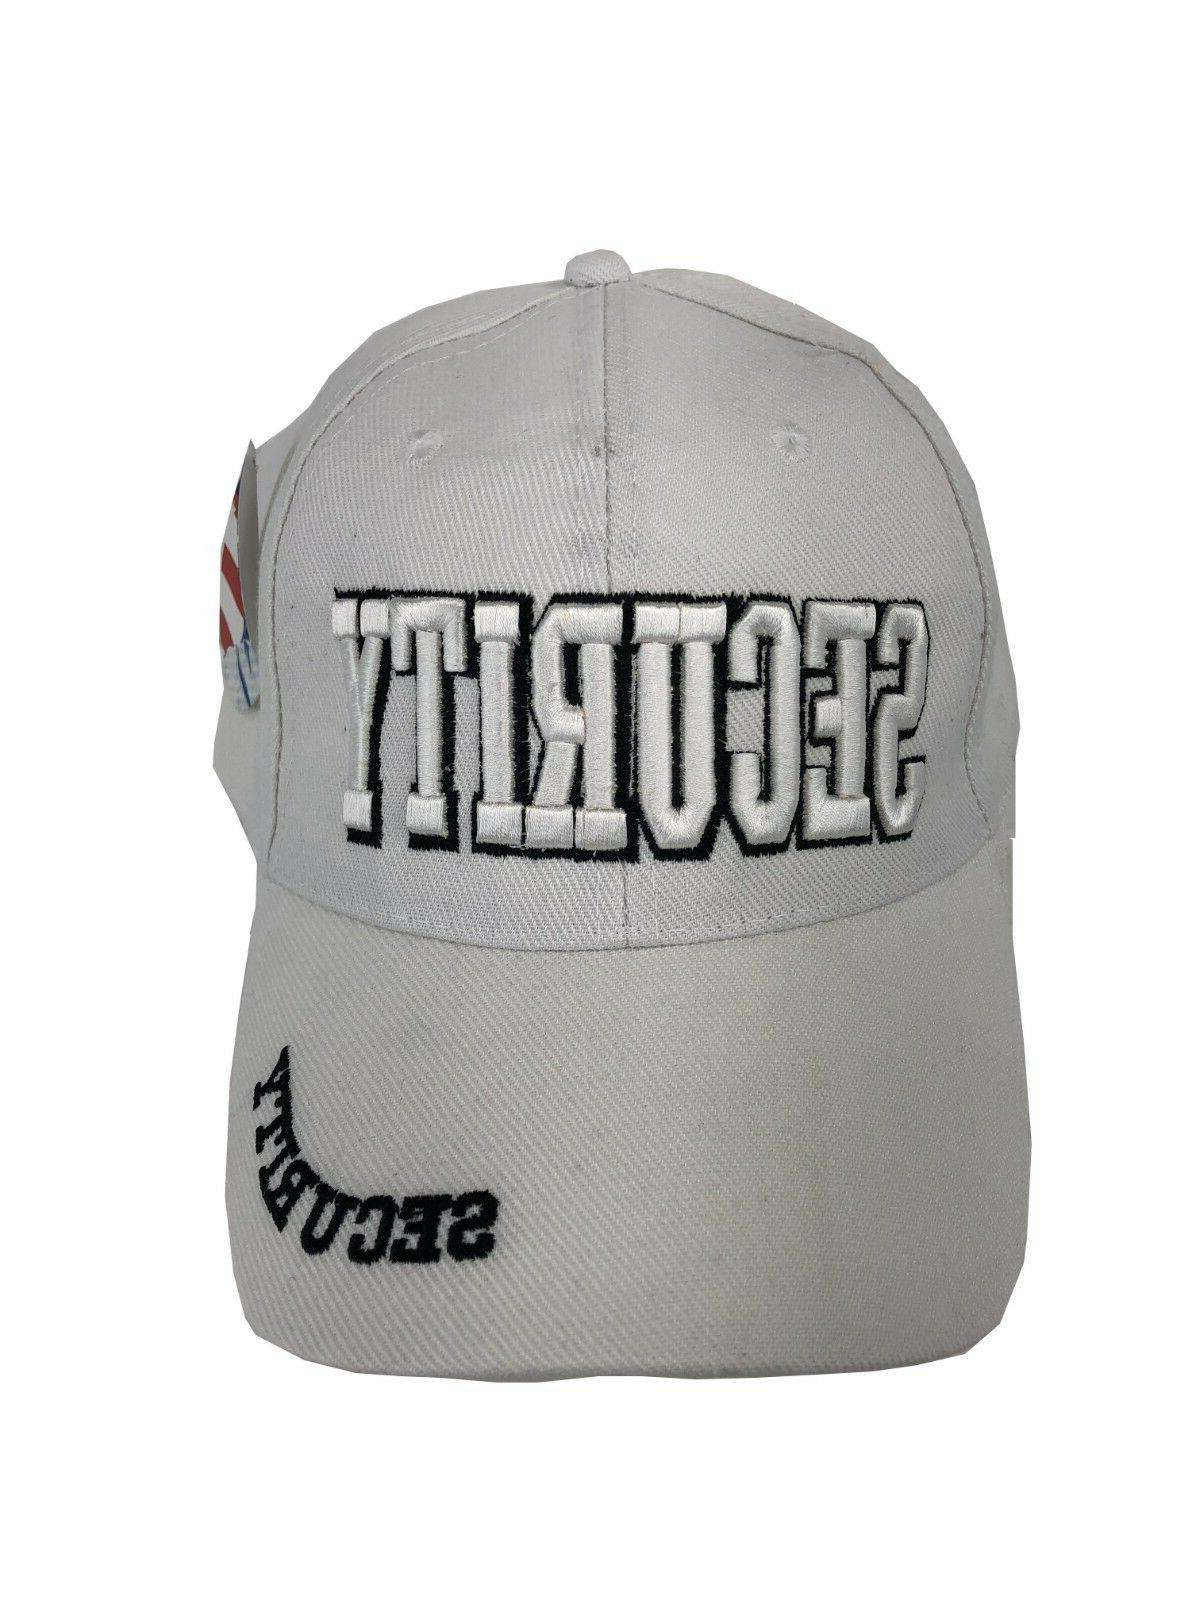 """SECURITY"" Fits All Baseball Cap Hat"